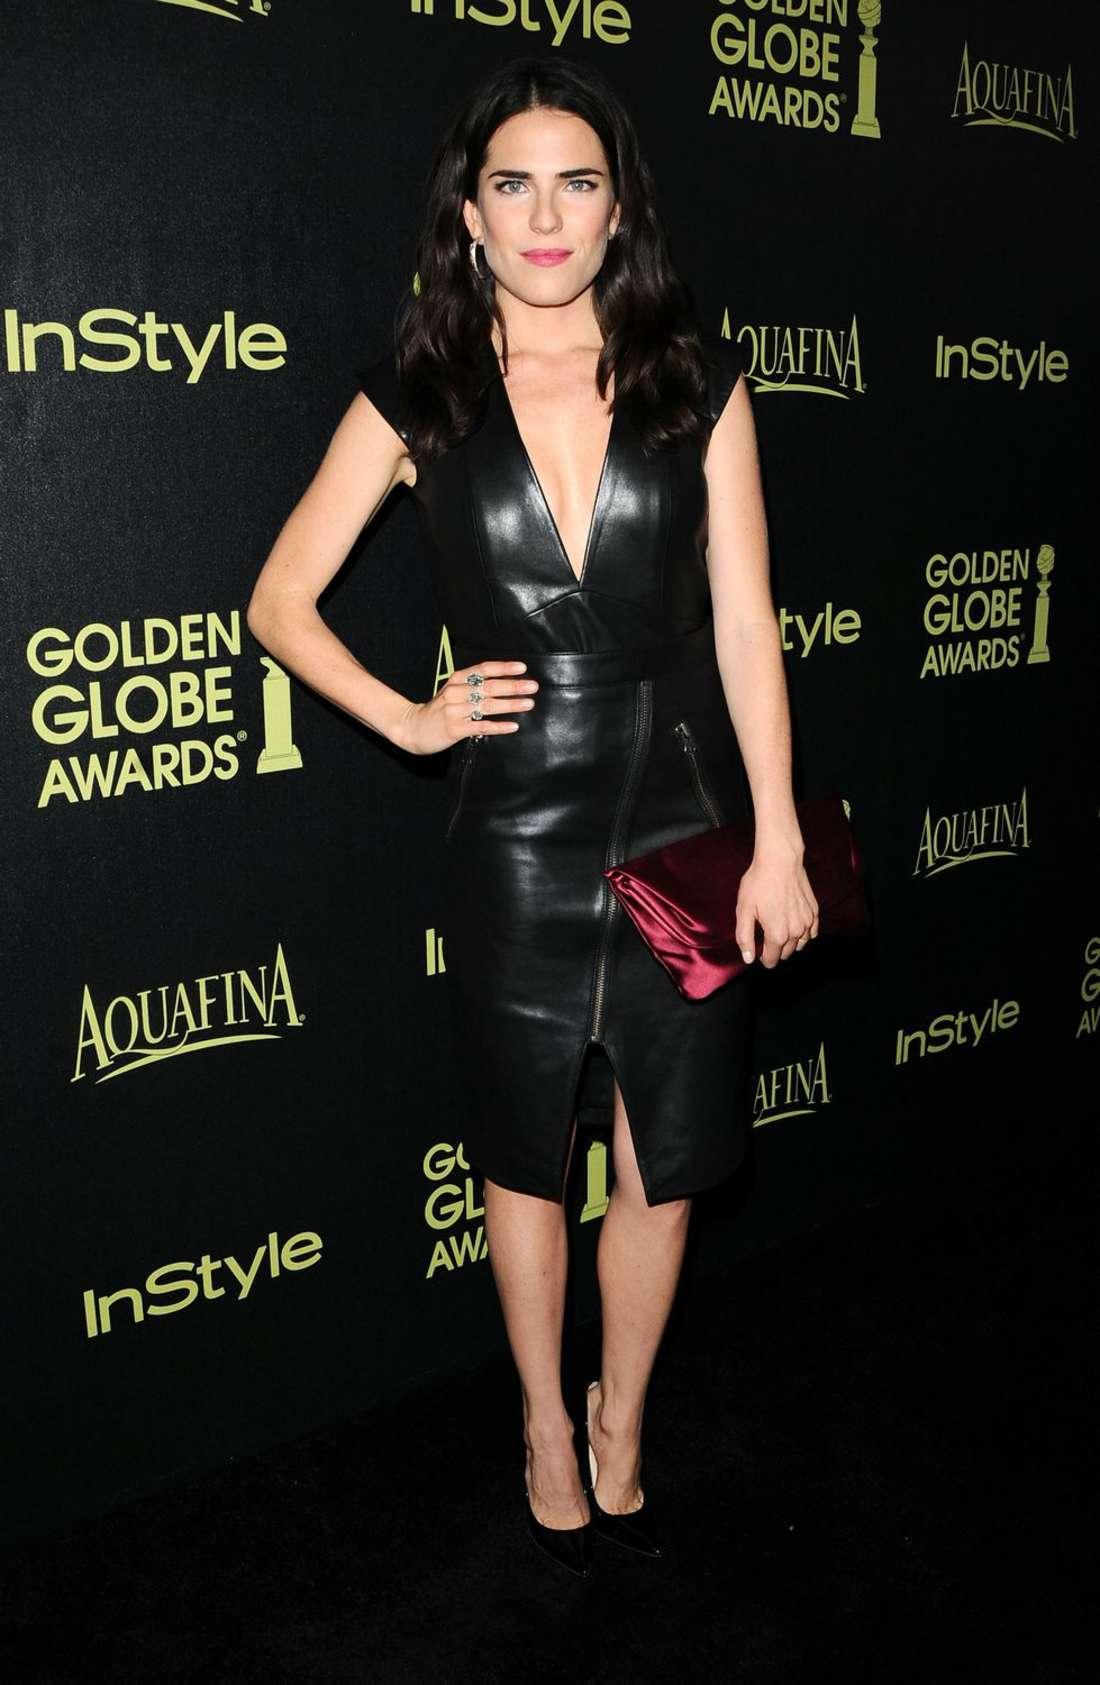 Karla Souza HFPA InStyle Celebrate Golden Globe Award Season in West Hollywood